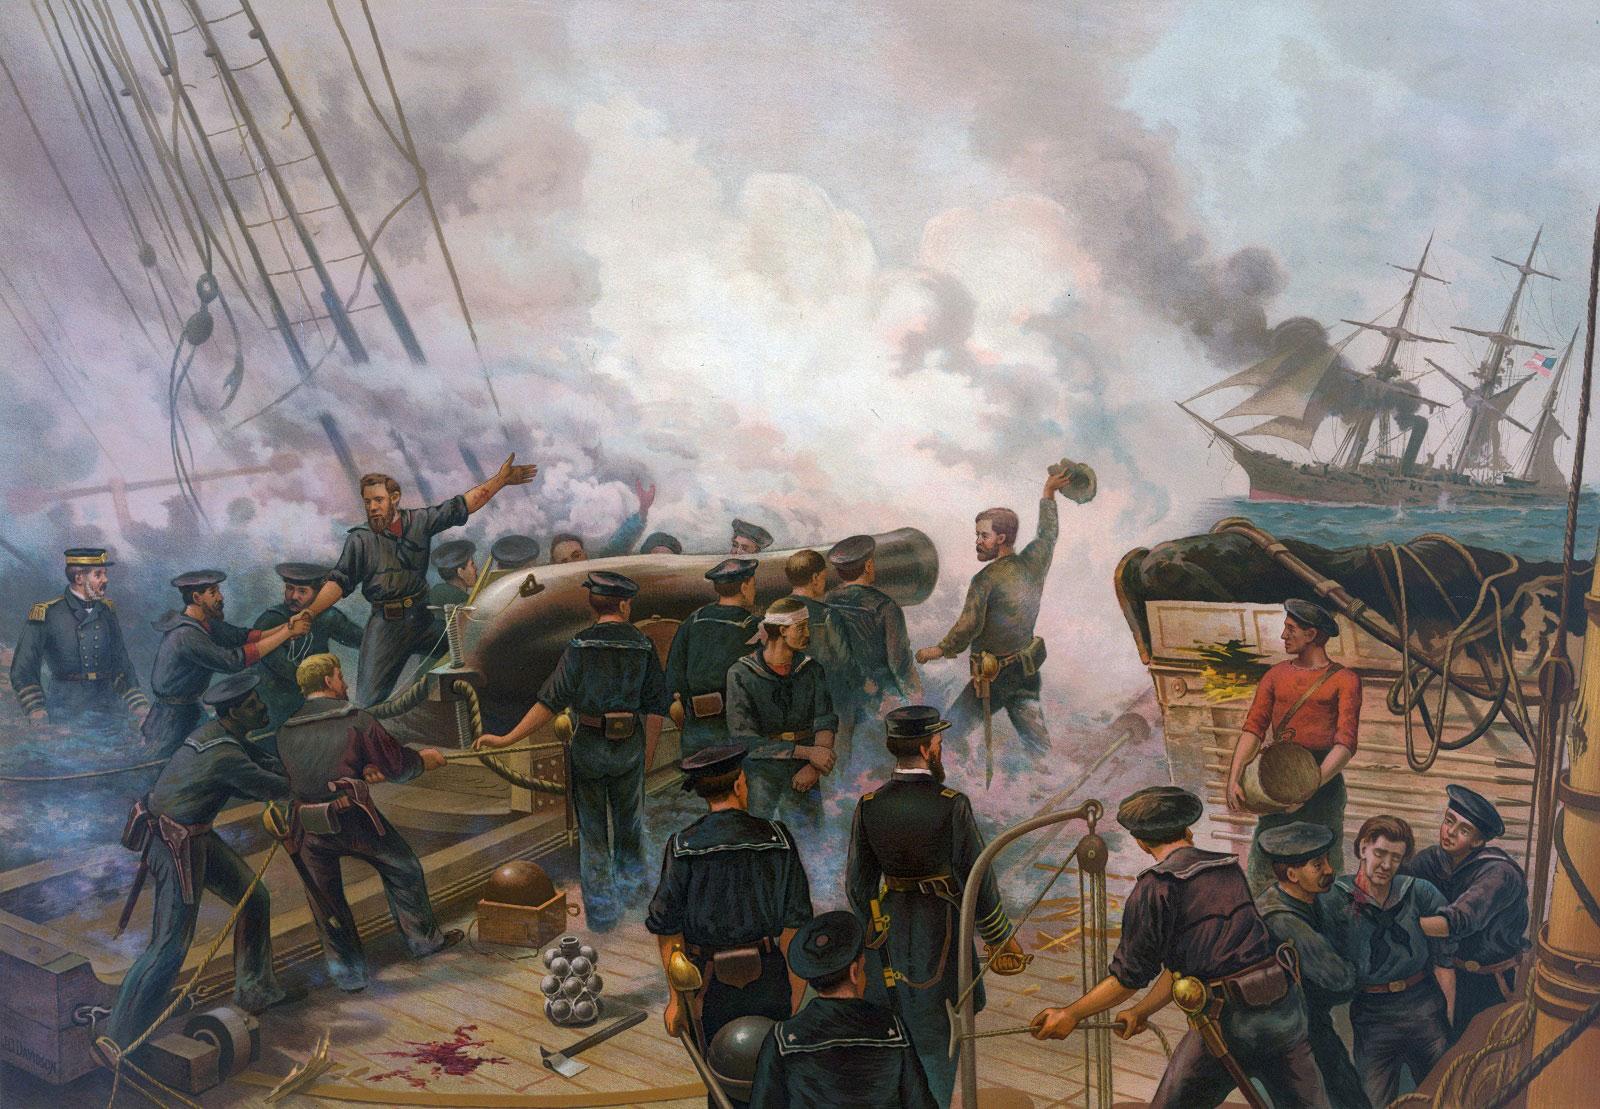 High Seas Duel Css Alabama Vs Uss Kearsarge By Don Hollway